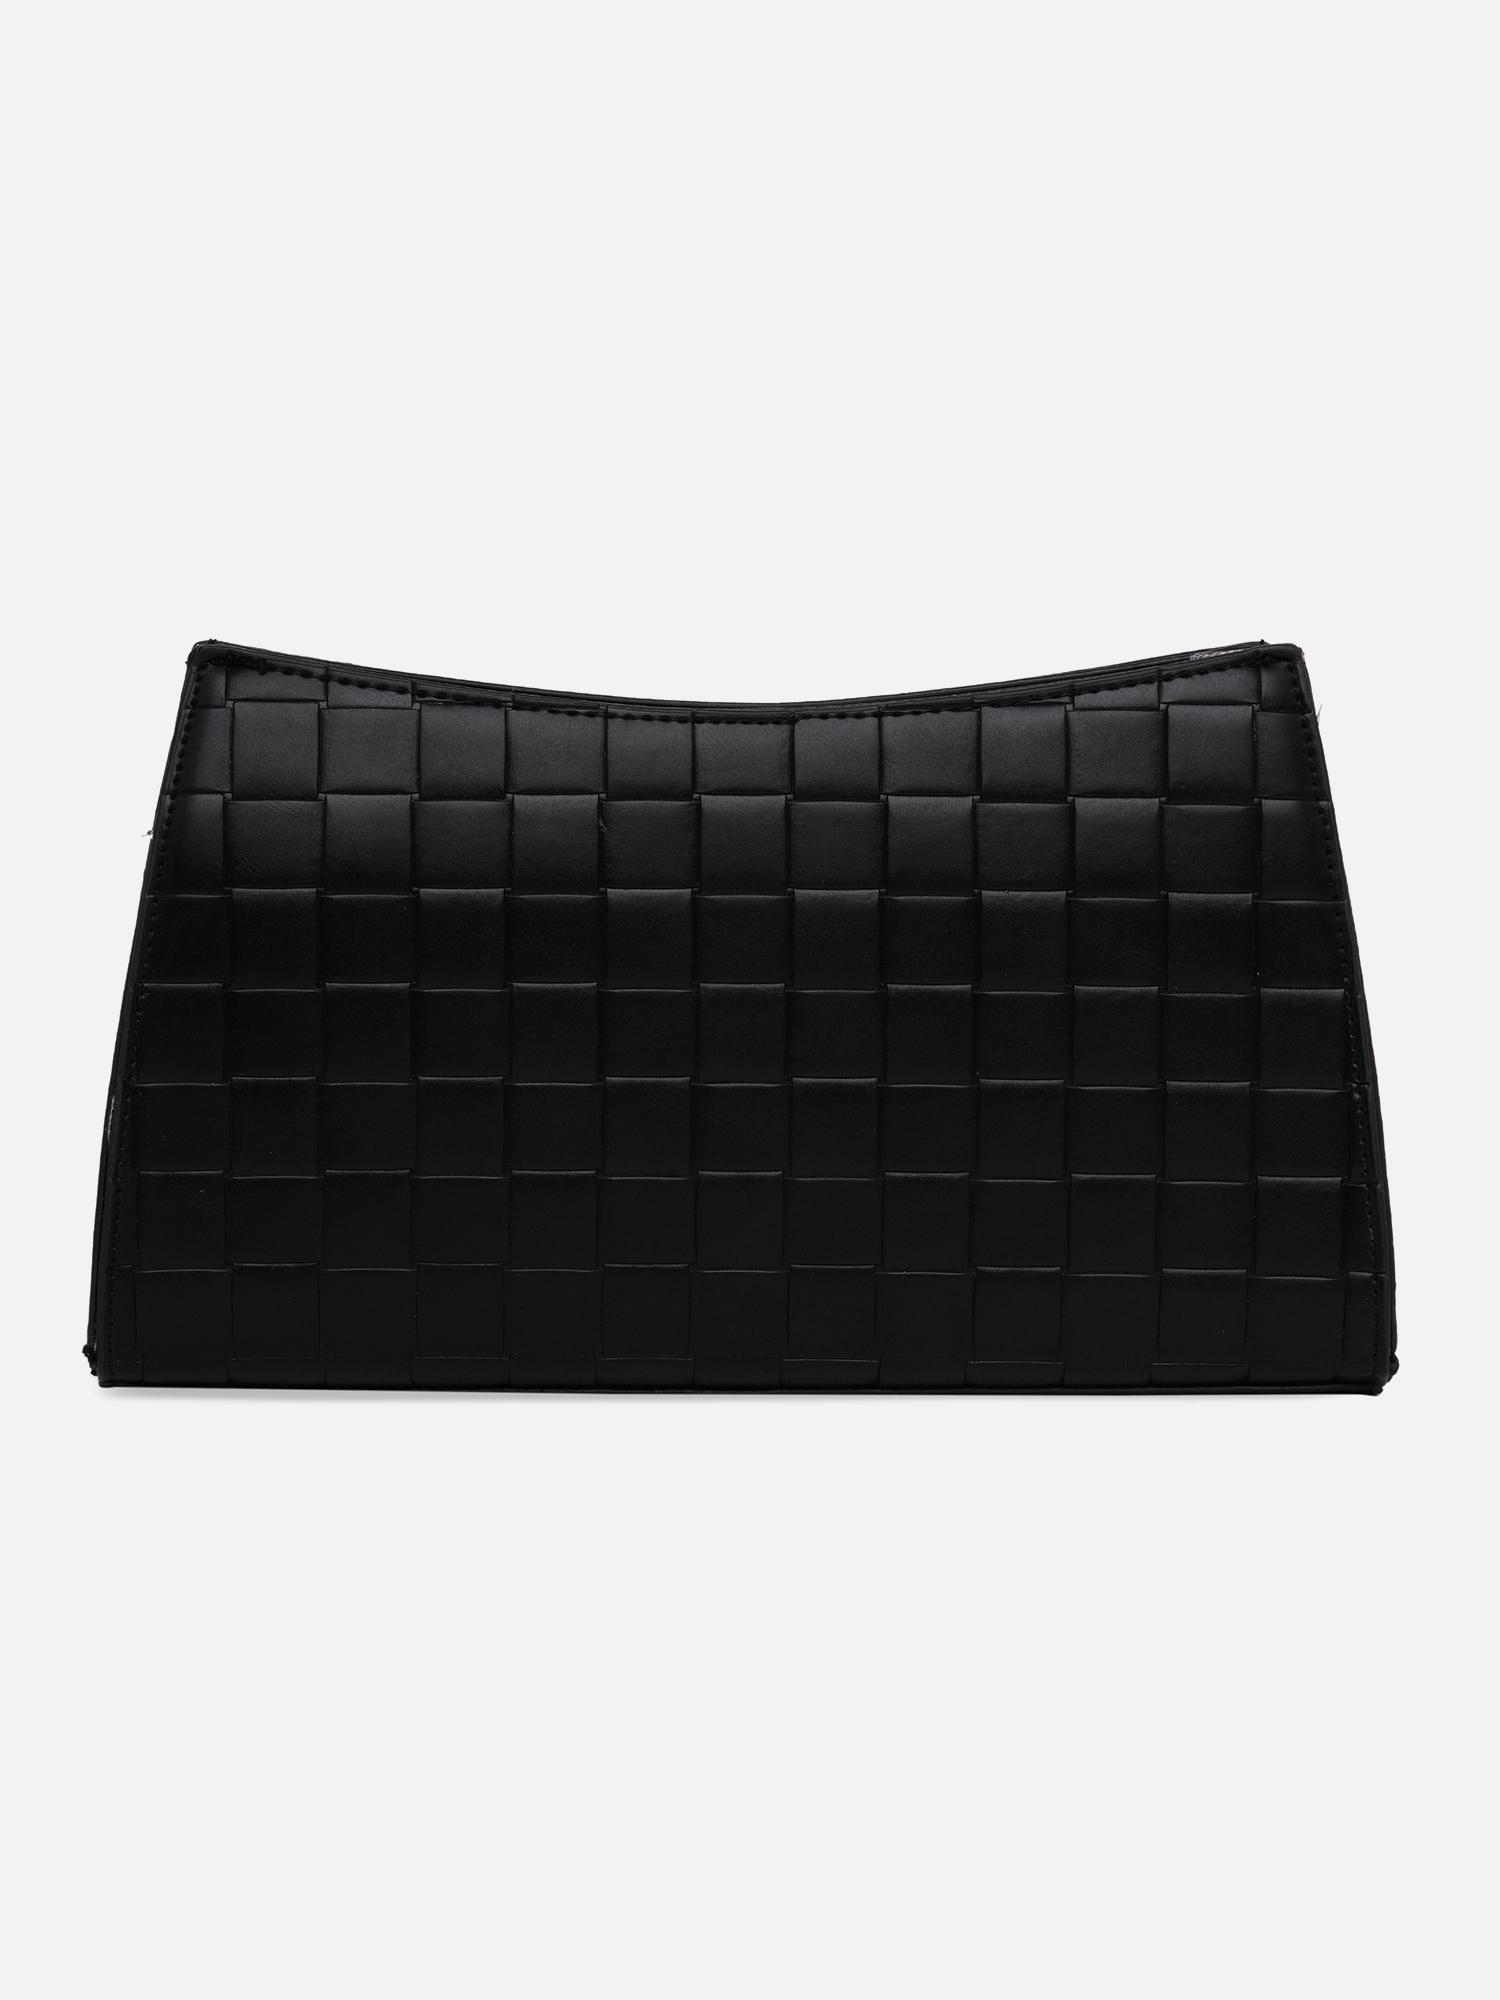 Slings-Black Check You Out Bag3